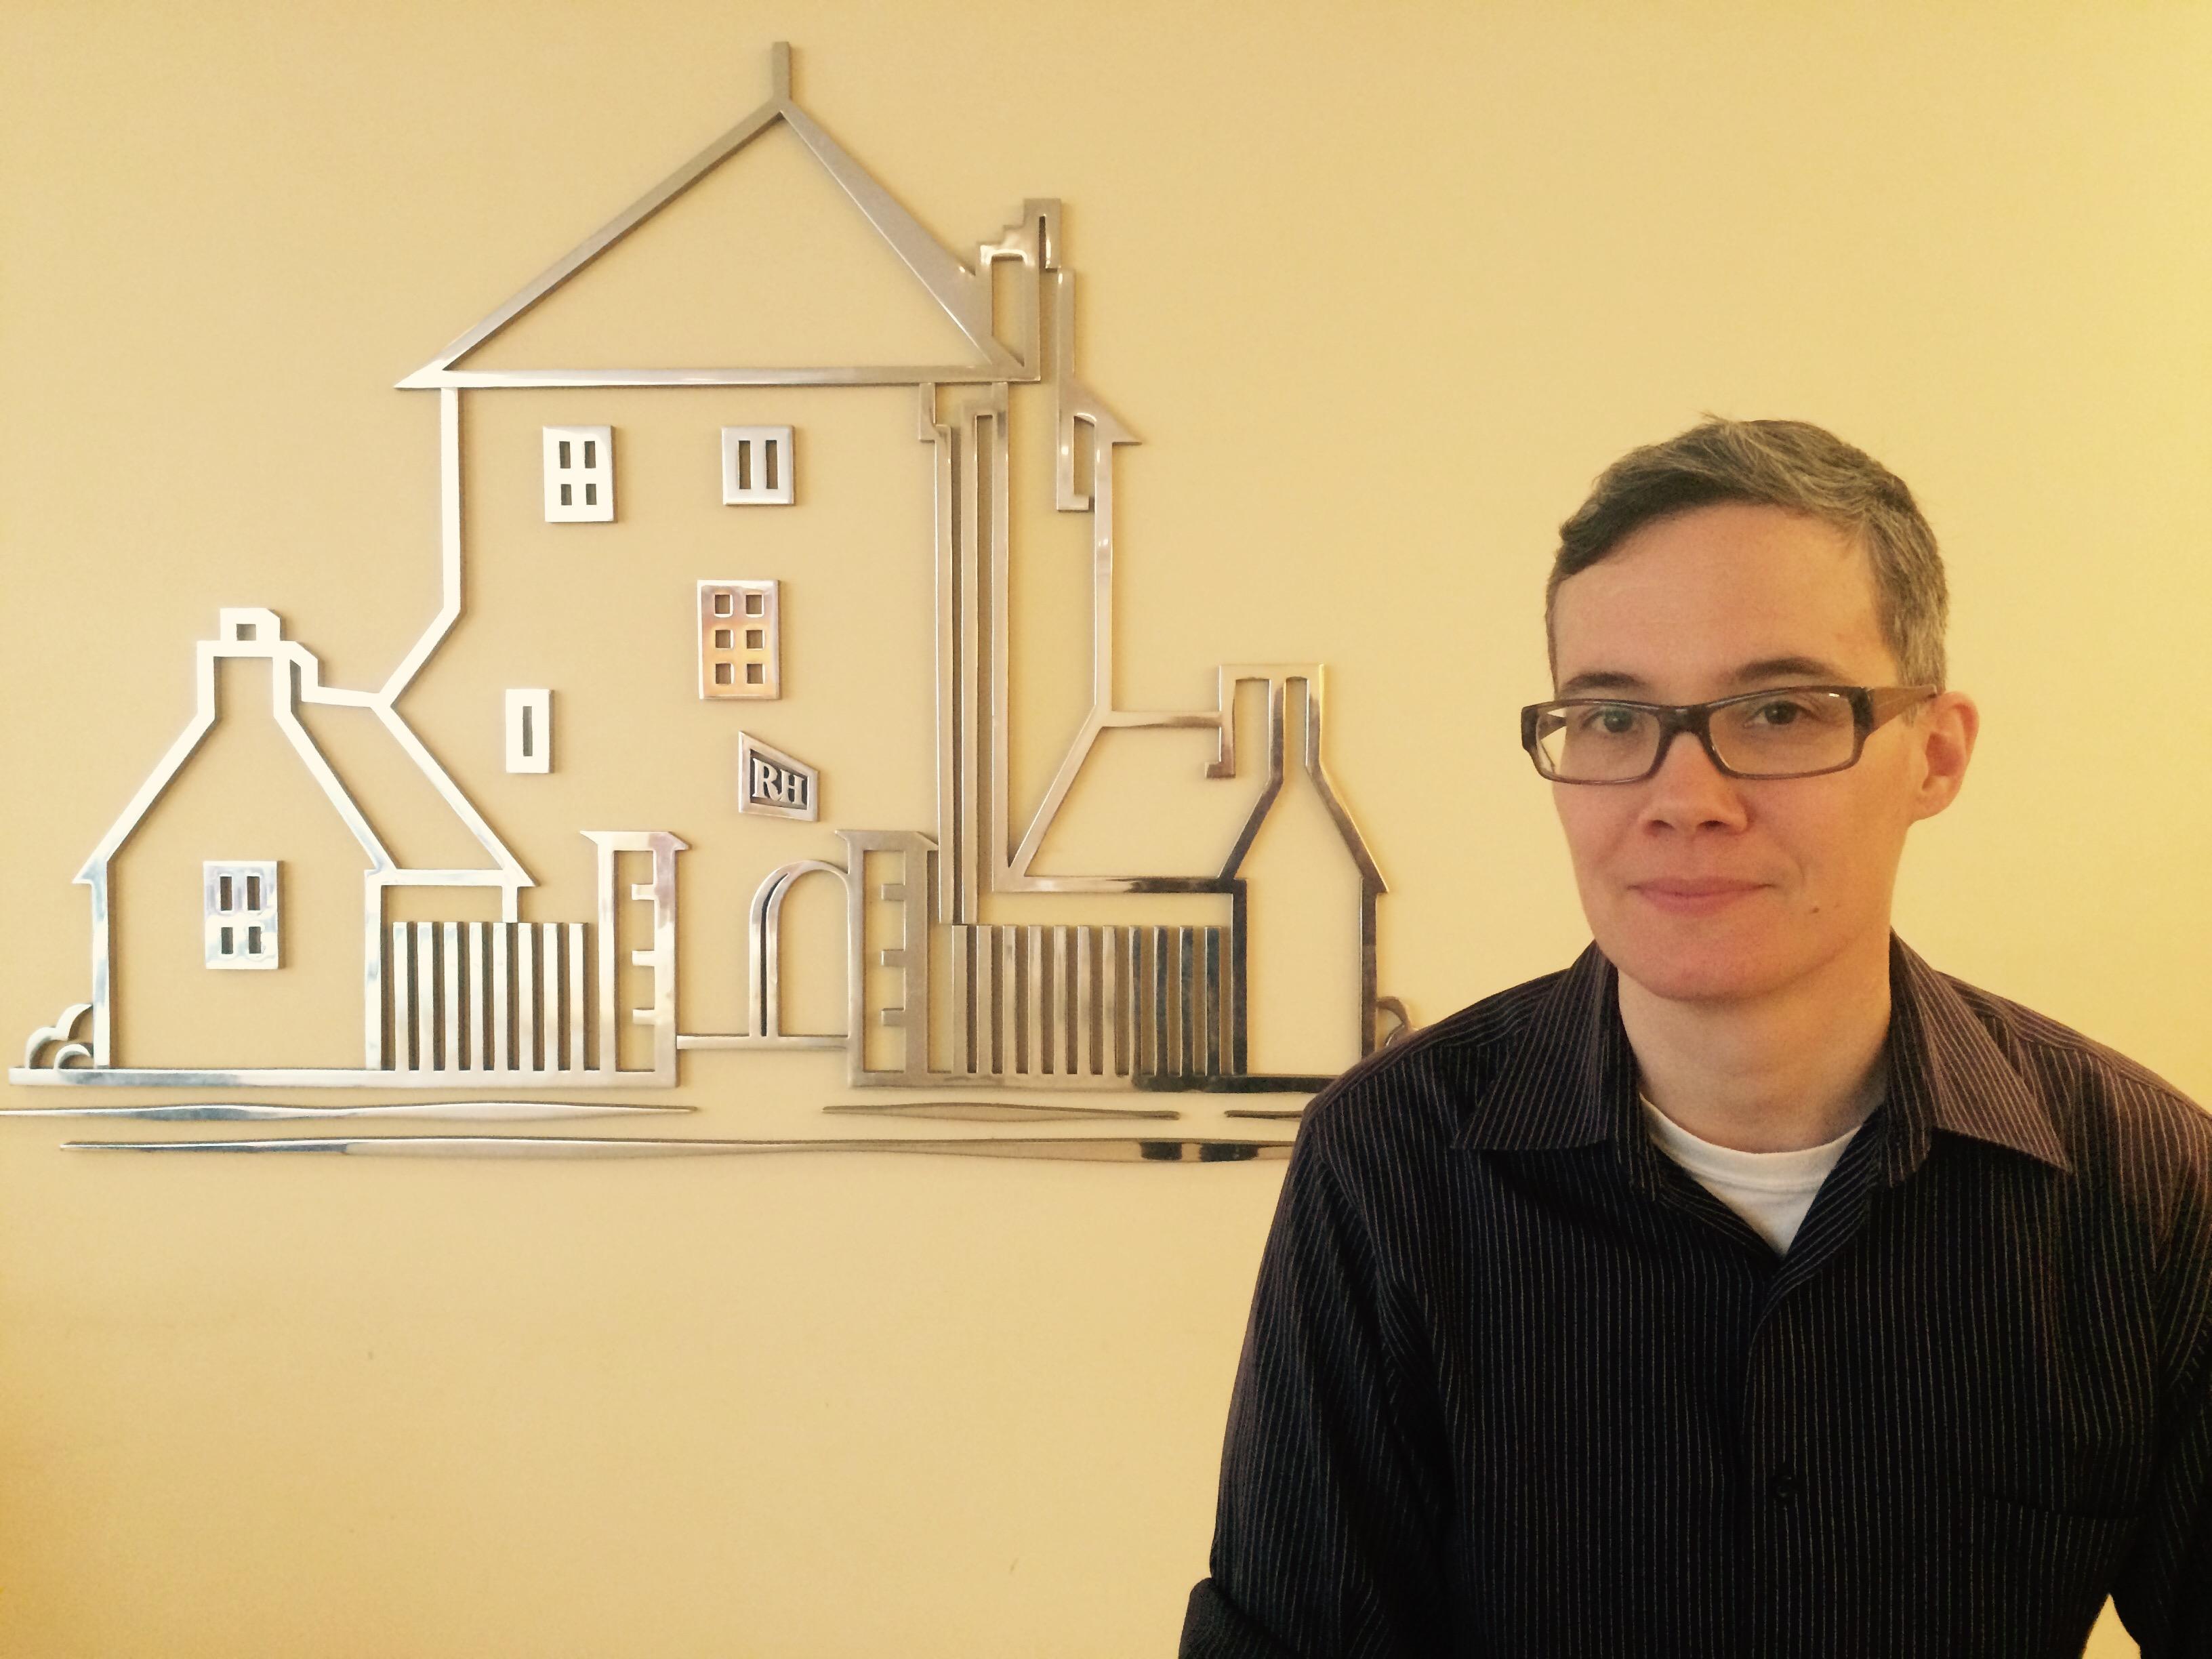 Ilsa Jule, Marketing Production Manager, Random House Children's Books